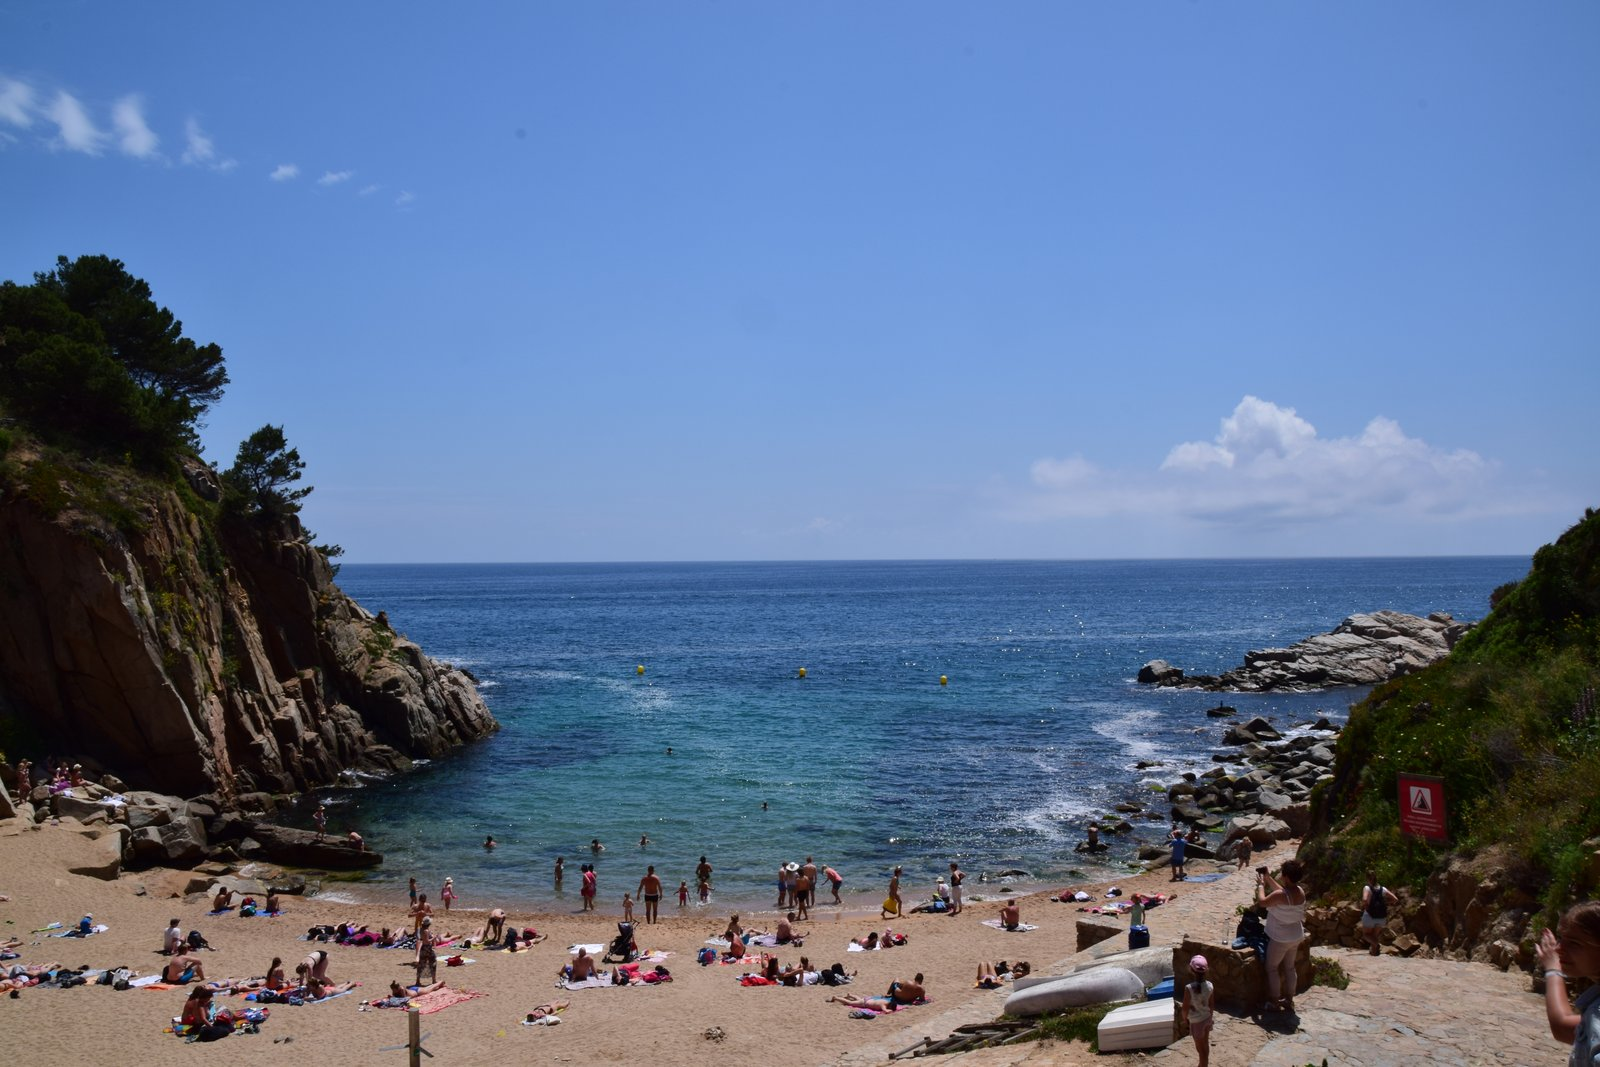 Strandbucht in Tossa de Mar